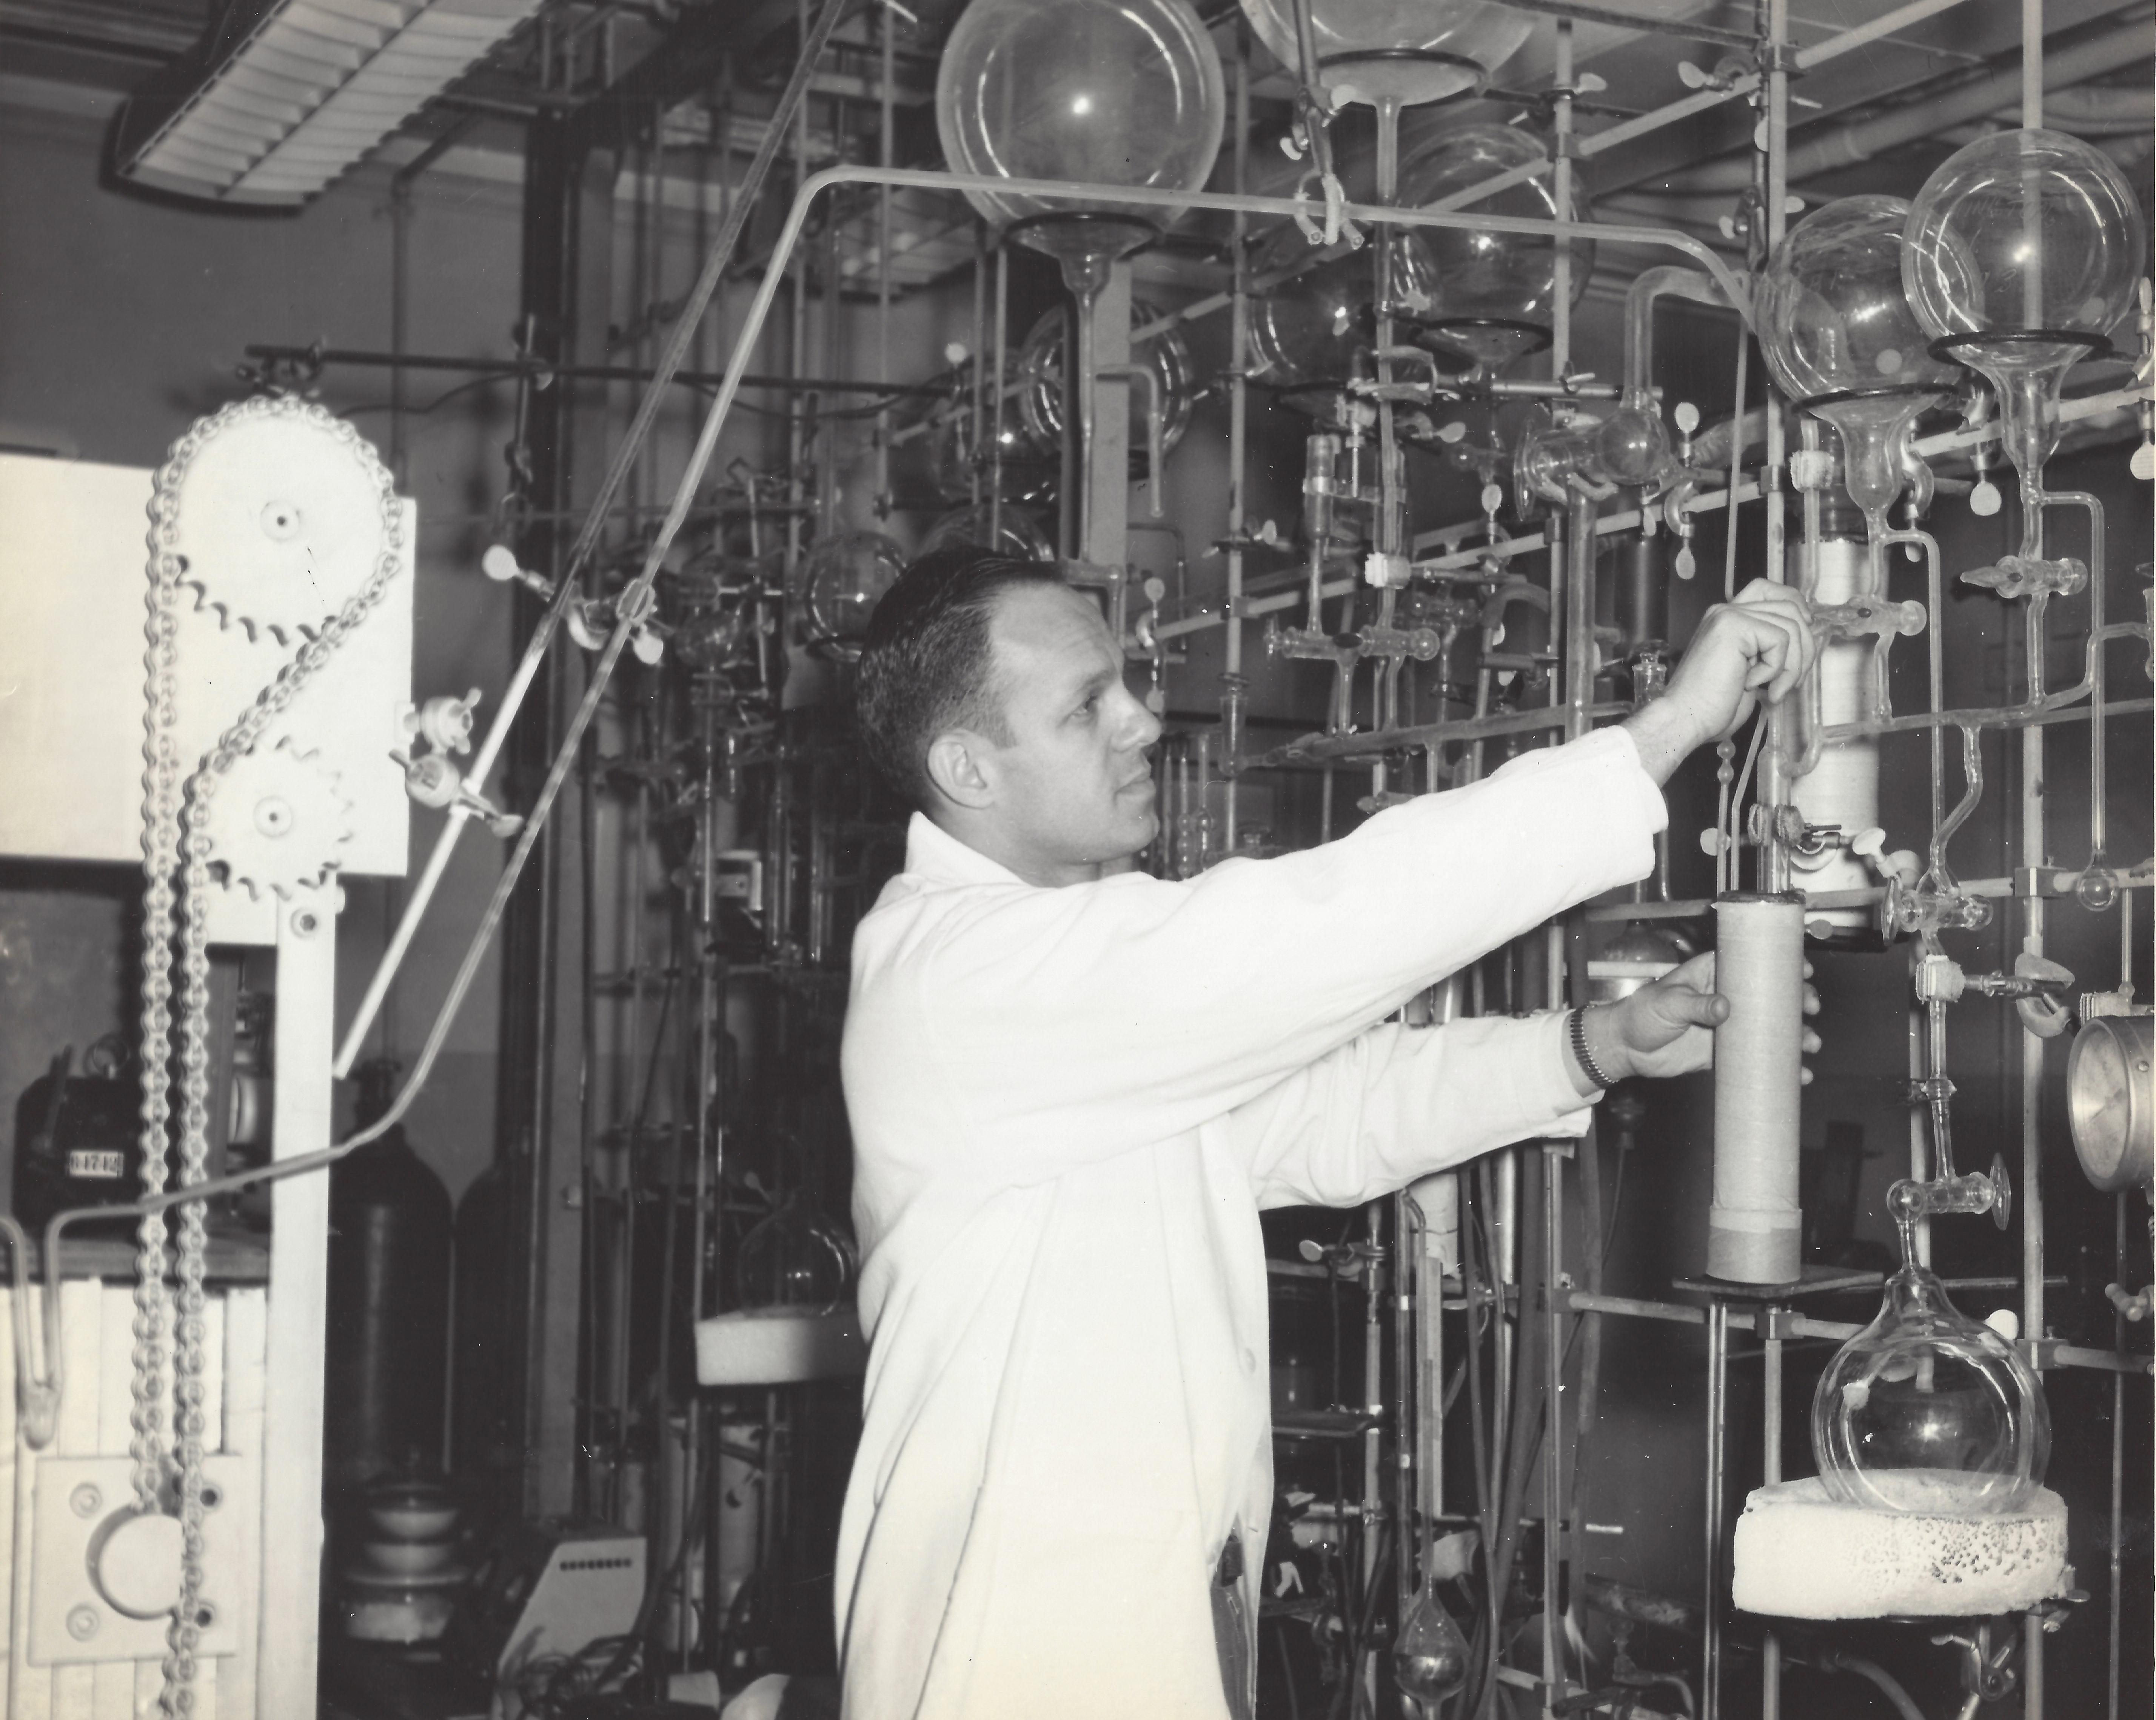 Willard Frank Libby radiocarbon dating